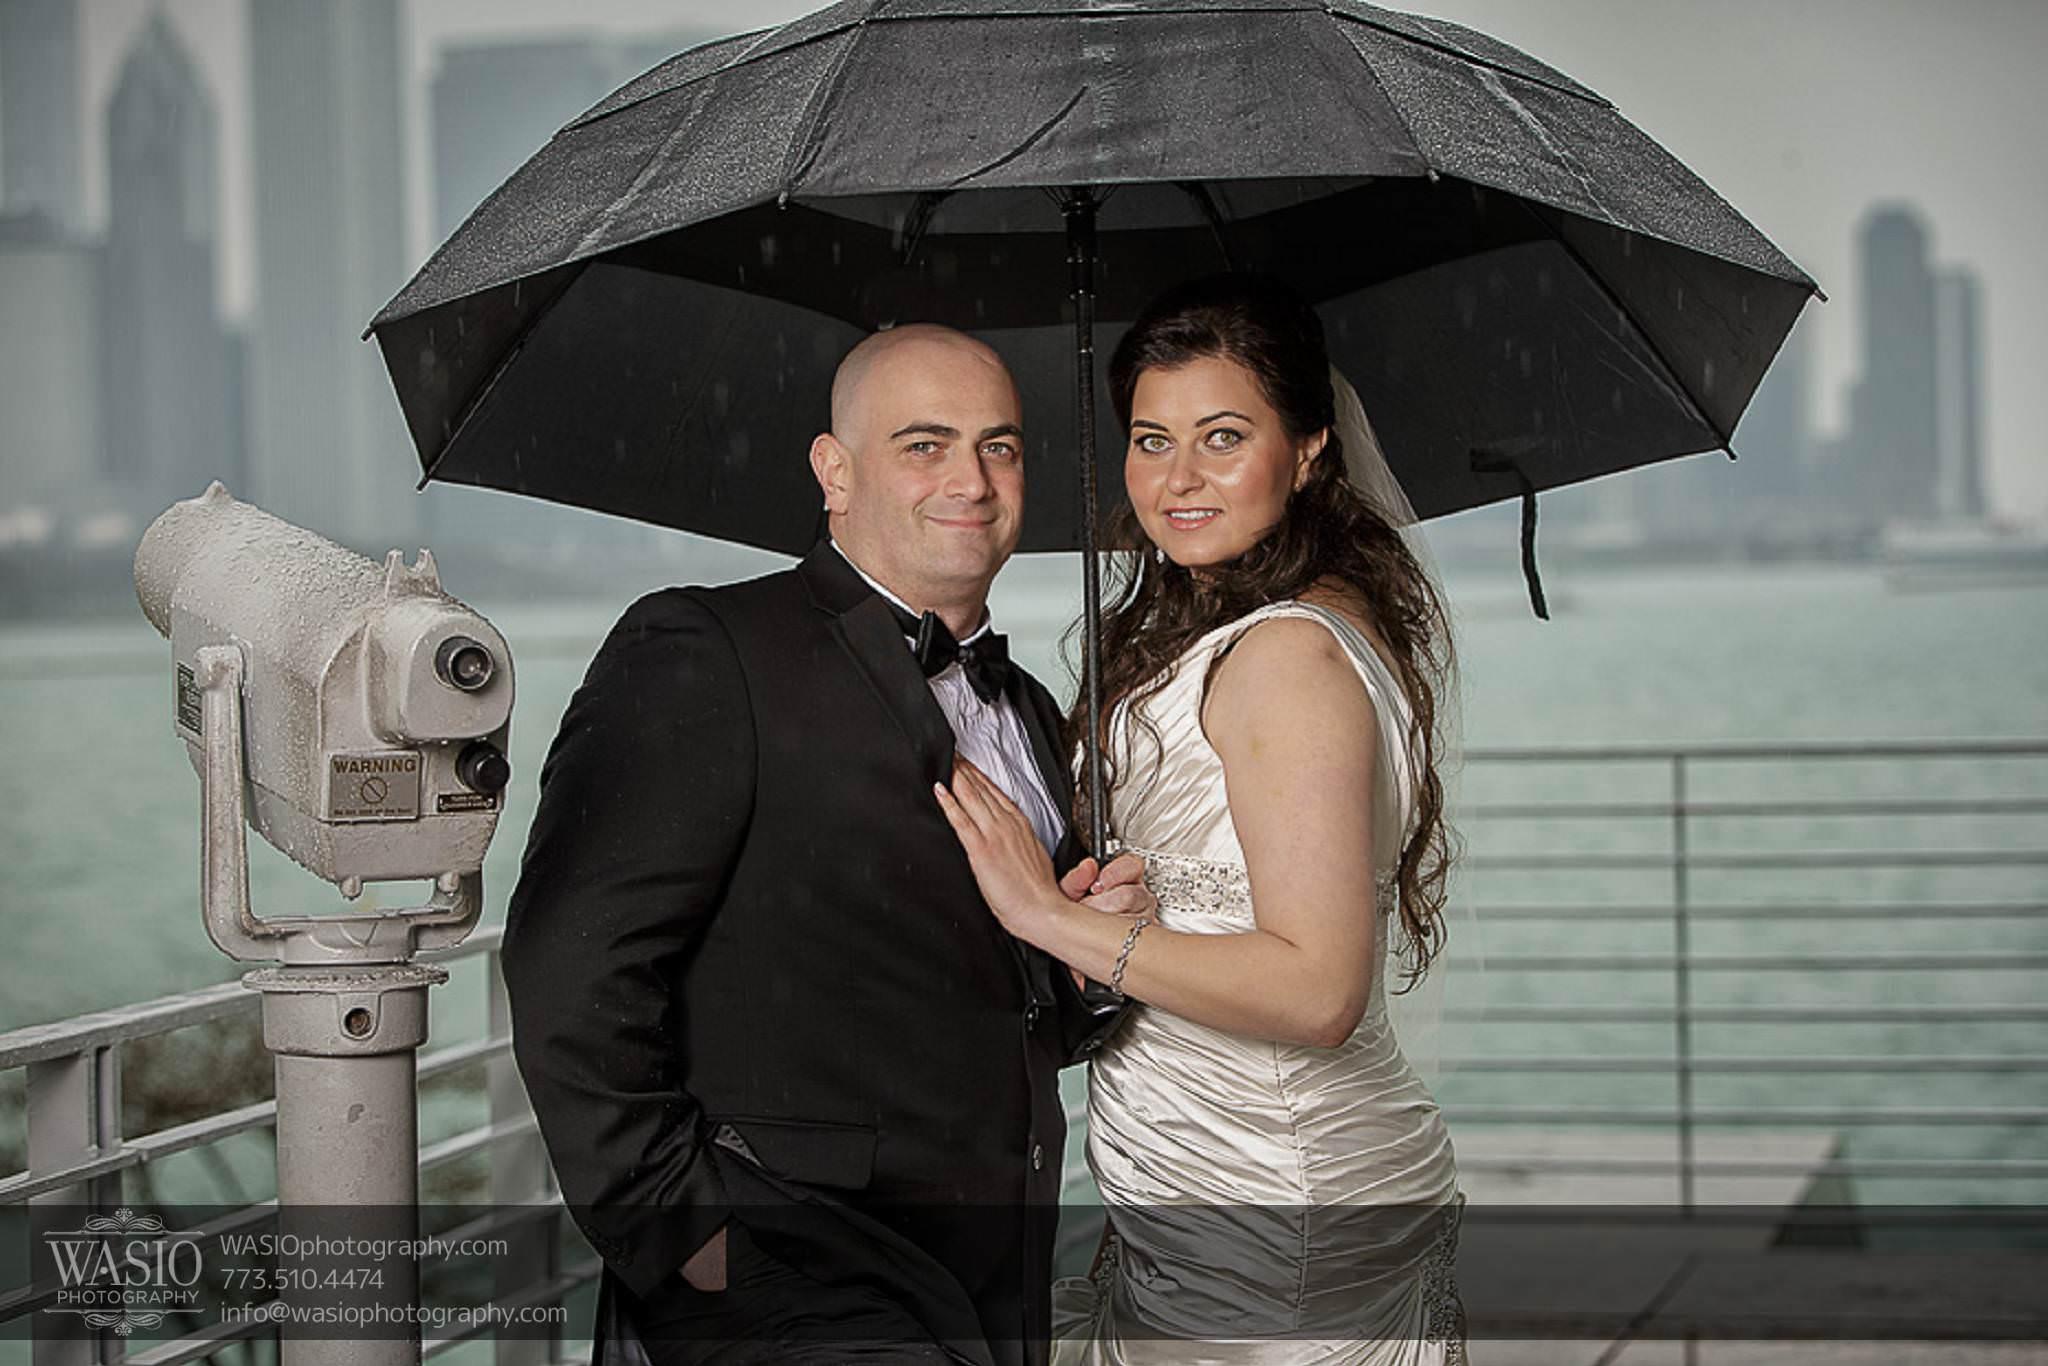 Chicago-wedding-photos-skyline-rainy-day-fun-057 Chicago Wedding Photos - Svetlana + Yuriy